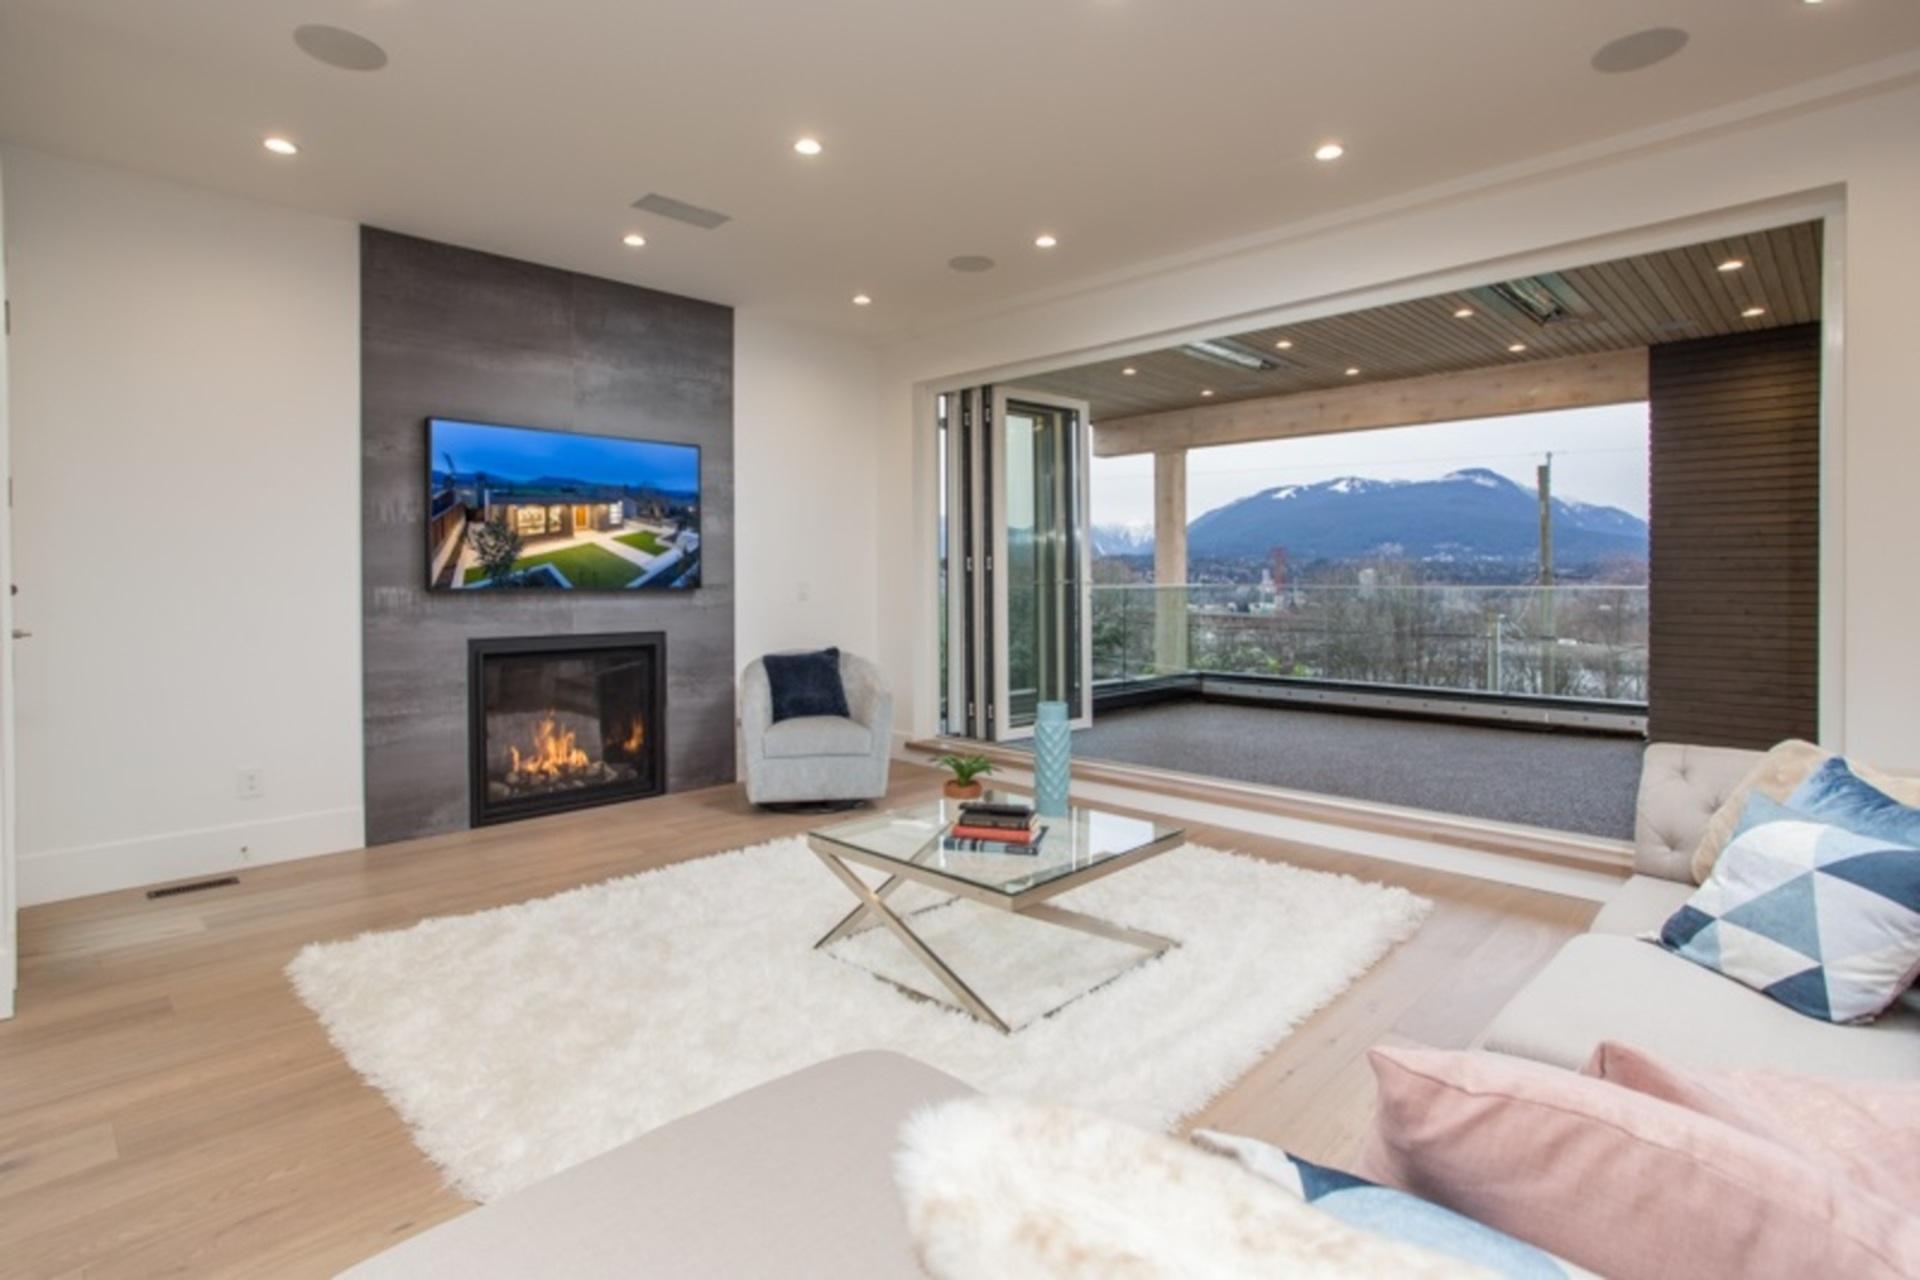 3831-edinburgh-street-vancouver-heights-burnaby-north-04 of 3831 Edinburgh Street, Vancouver Heights, Burnaby North